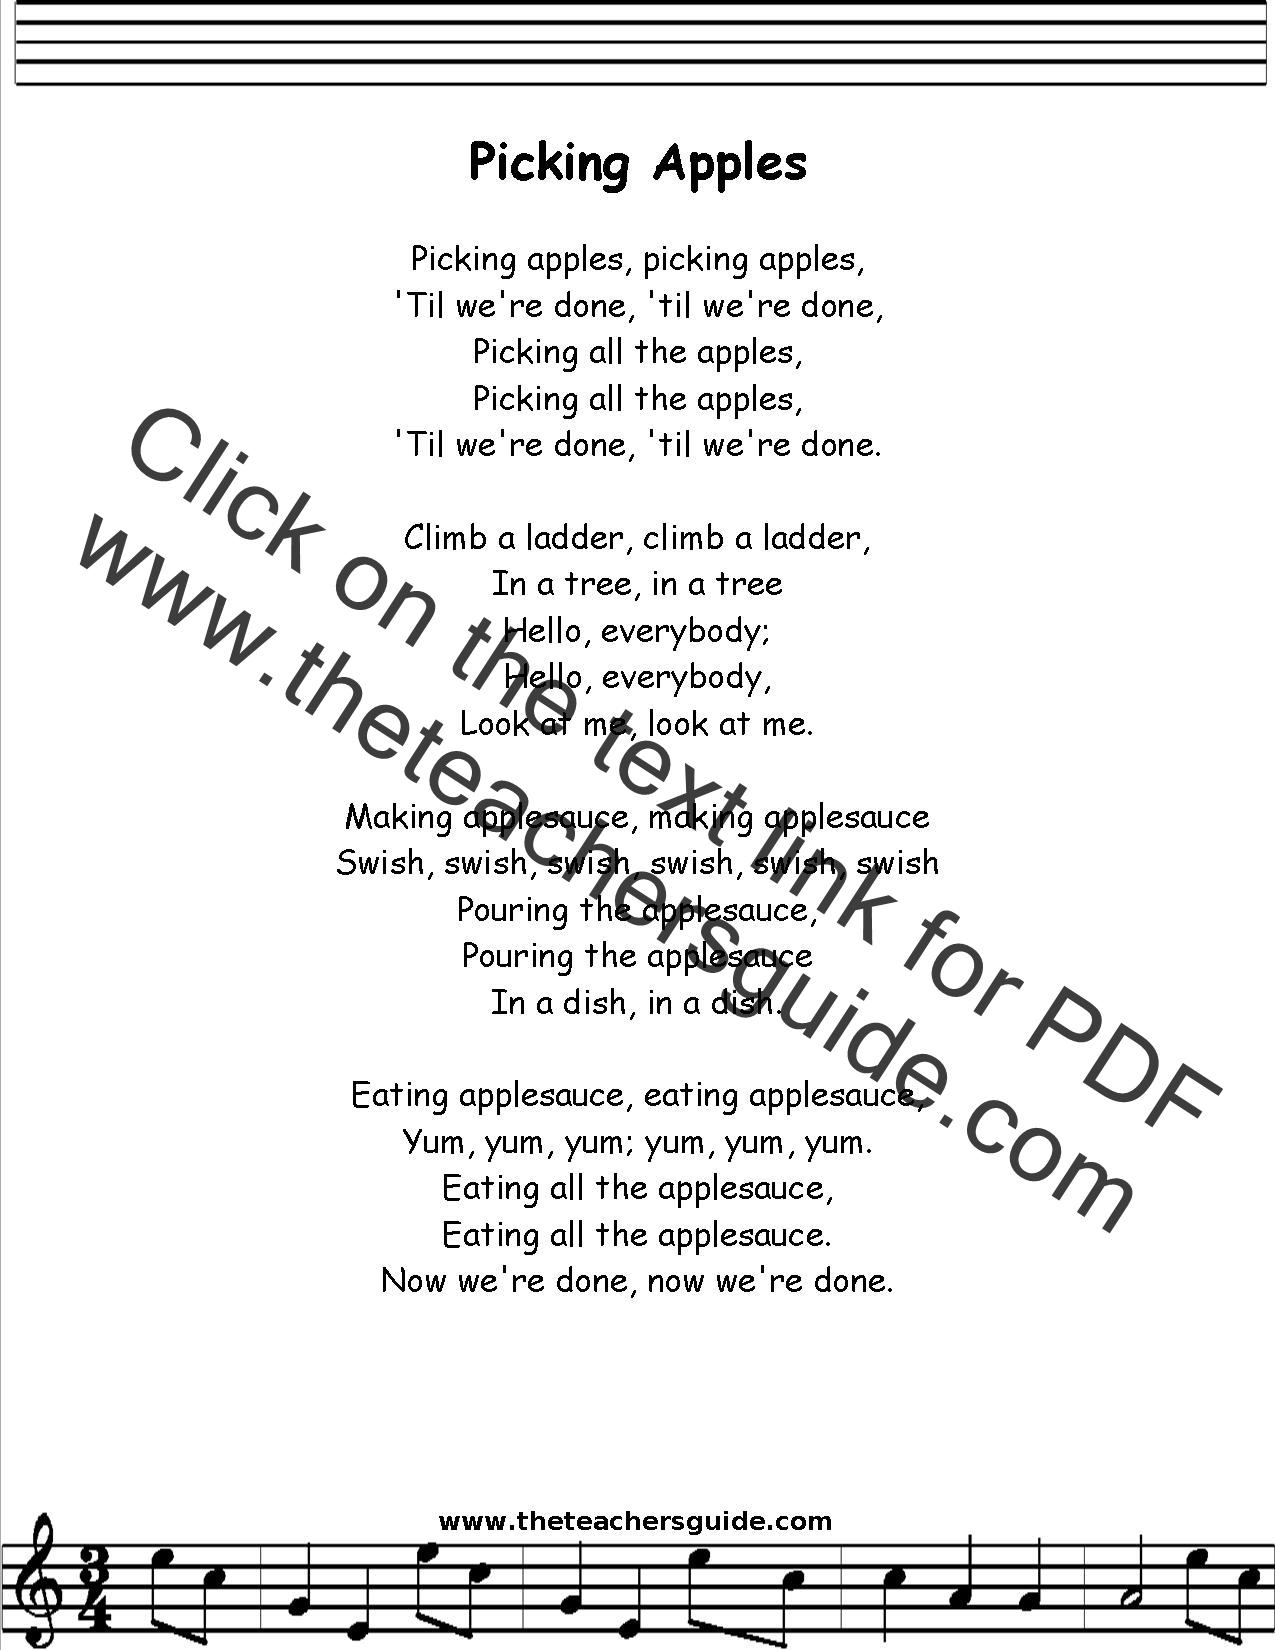 Picking Apples Lyrics Printout Midi And Video